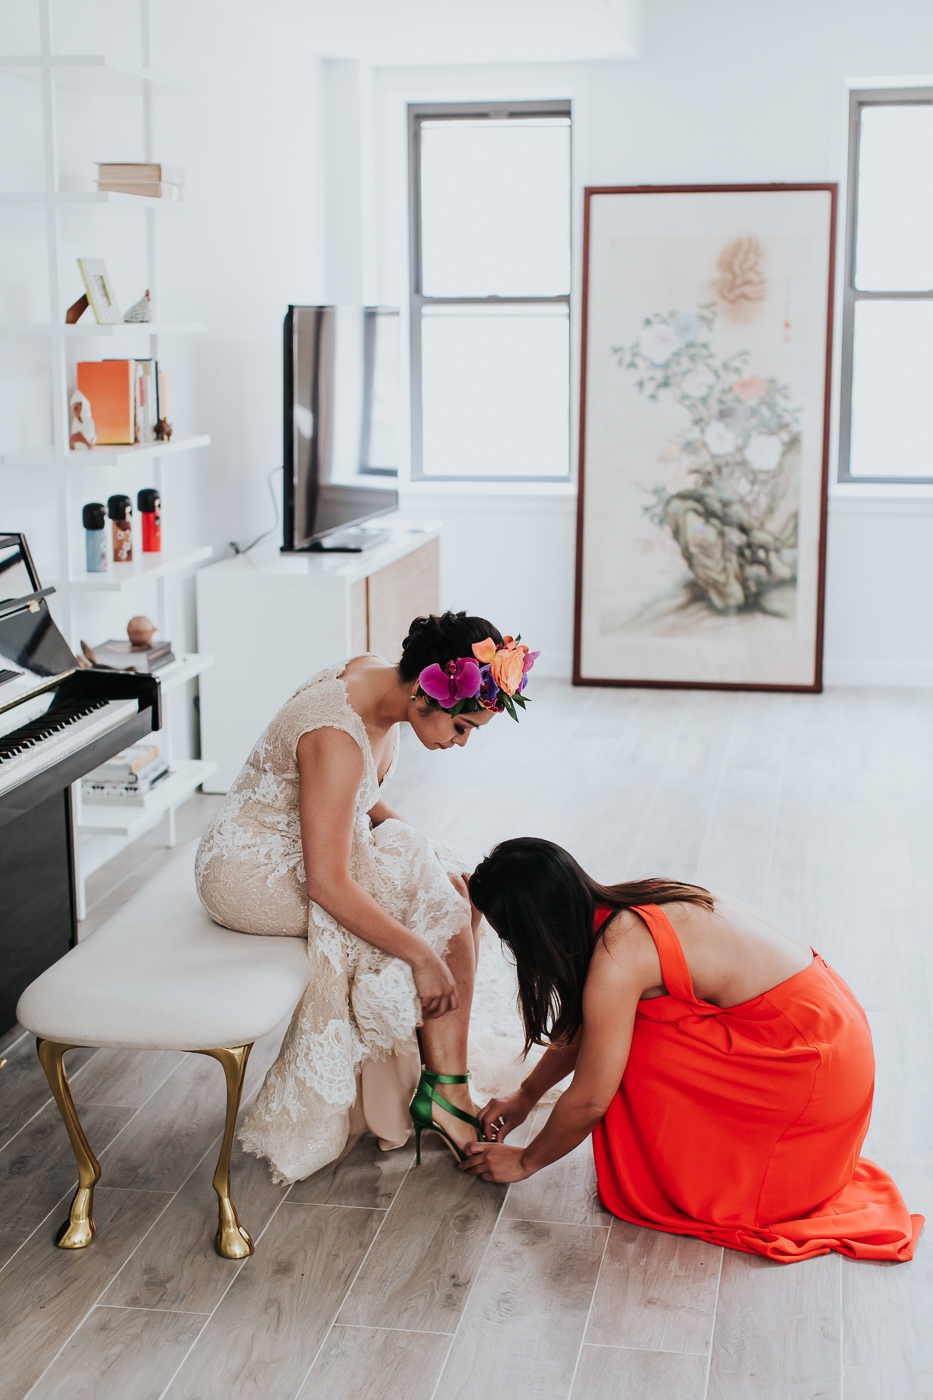 501-Union-Brooklyn-Documentary-Wedding-Photographer-11.jpg